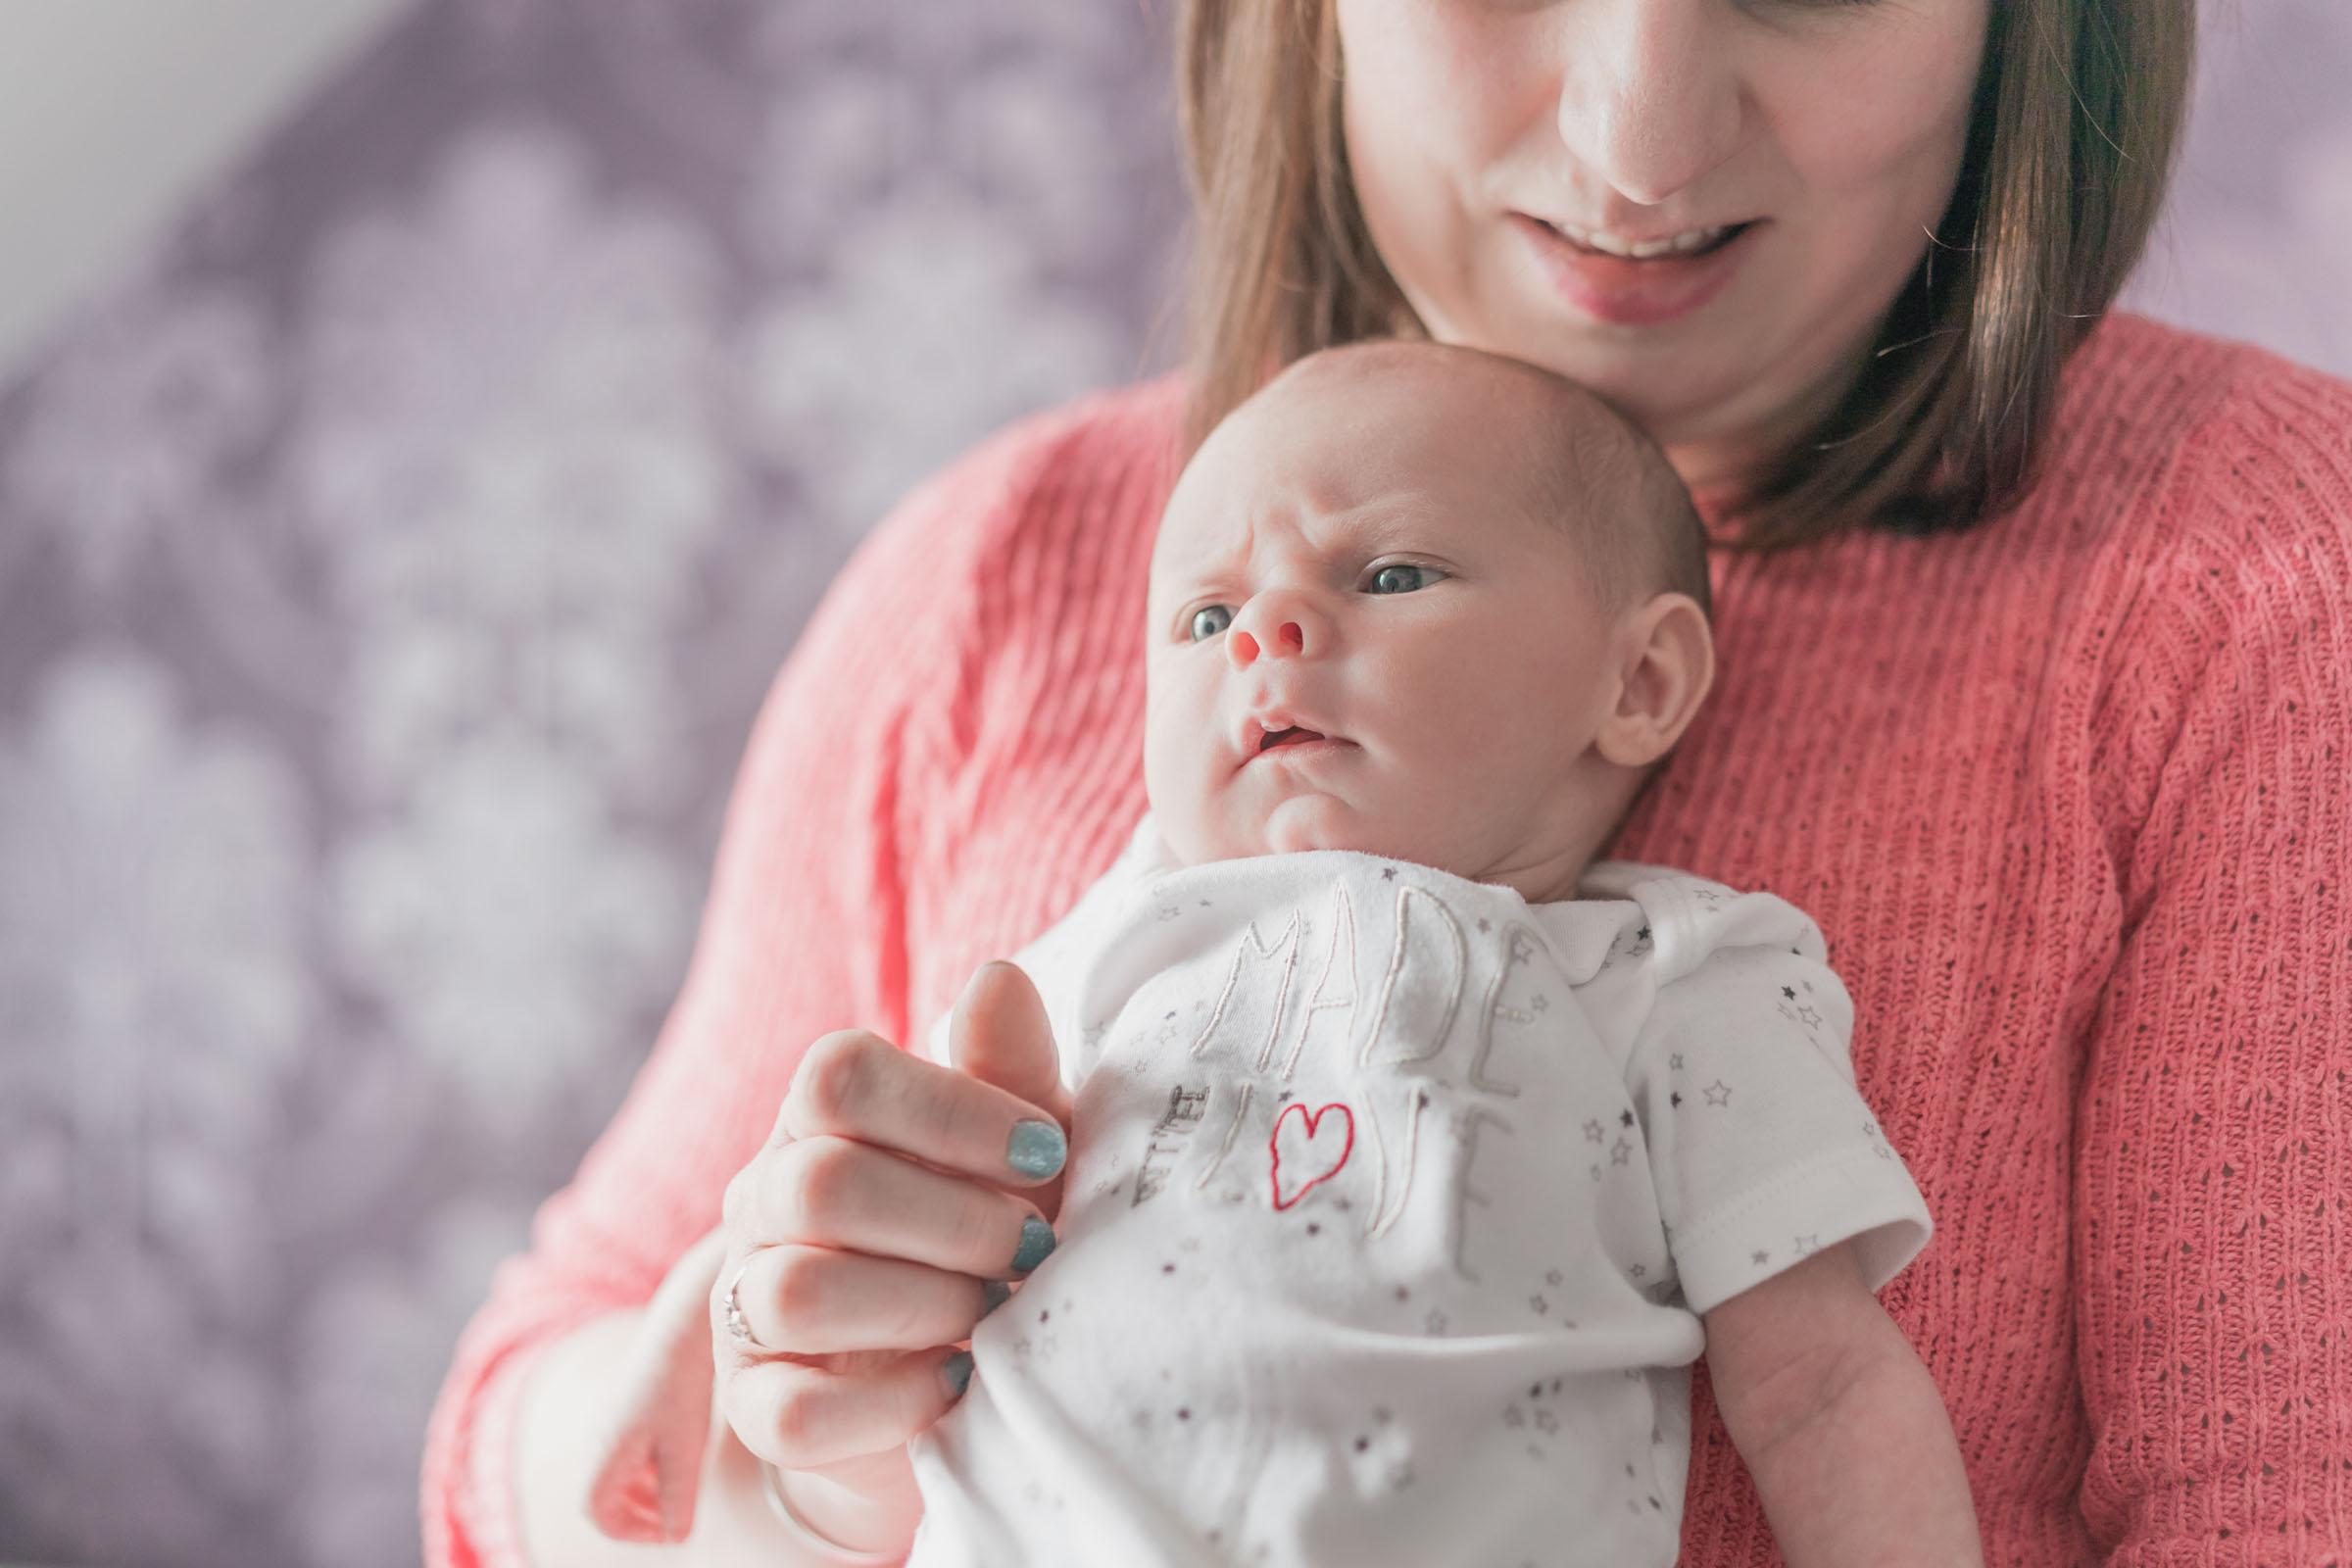 documentary_newborn_photography_glasgow_dearlyphotography (9 of 12).jpg